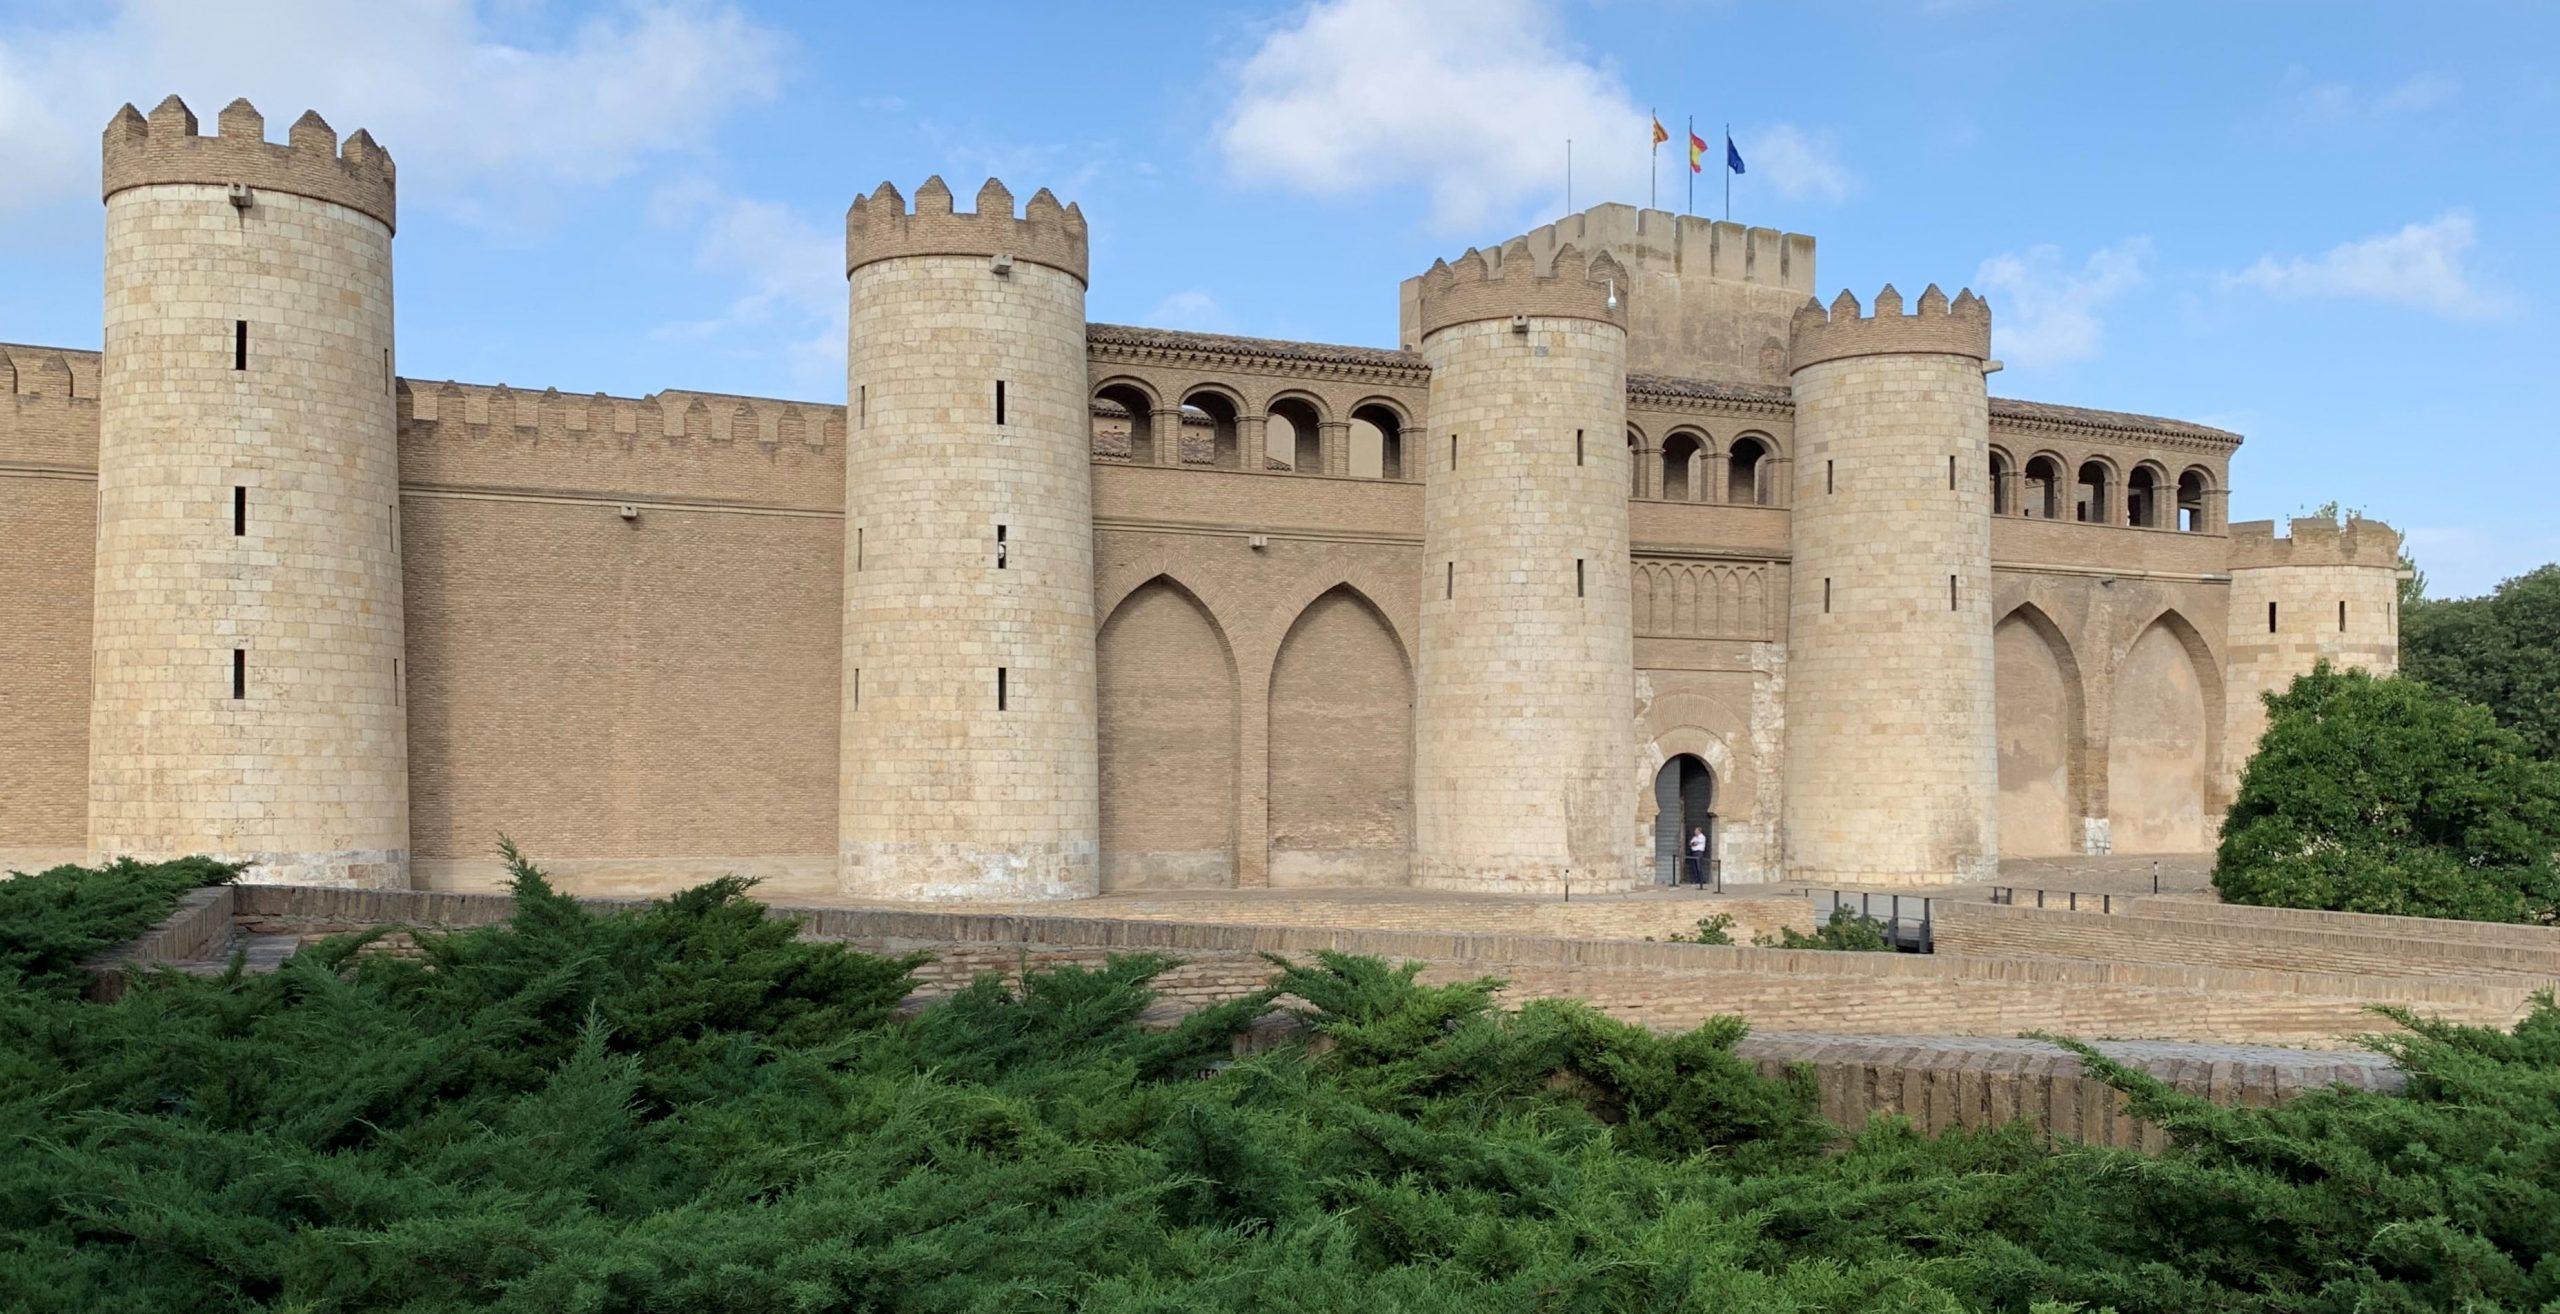 entrée du palais aljaferia